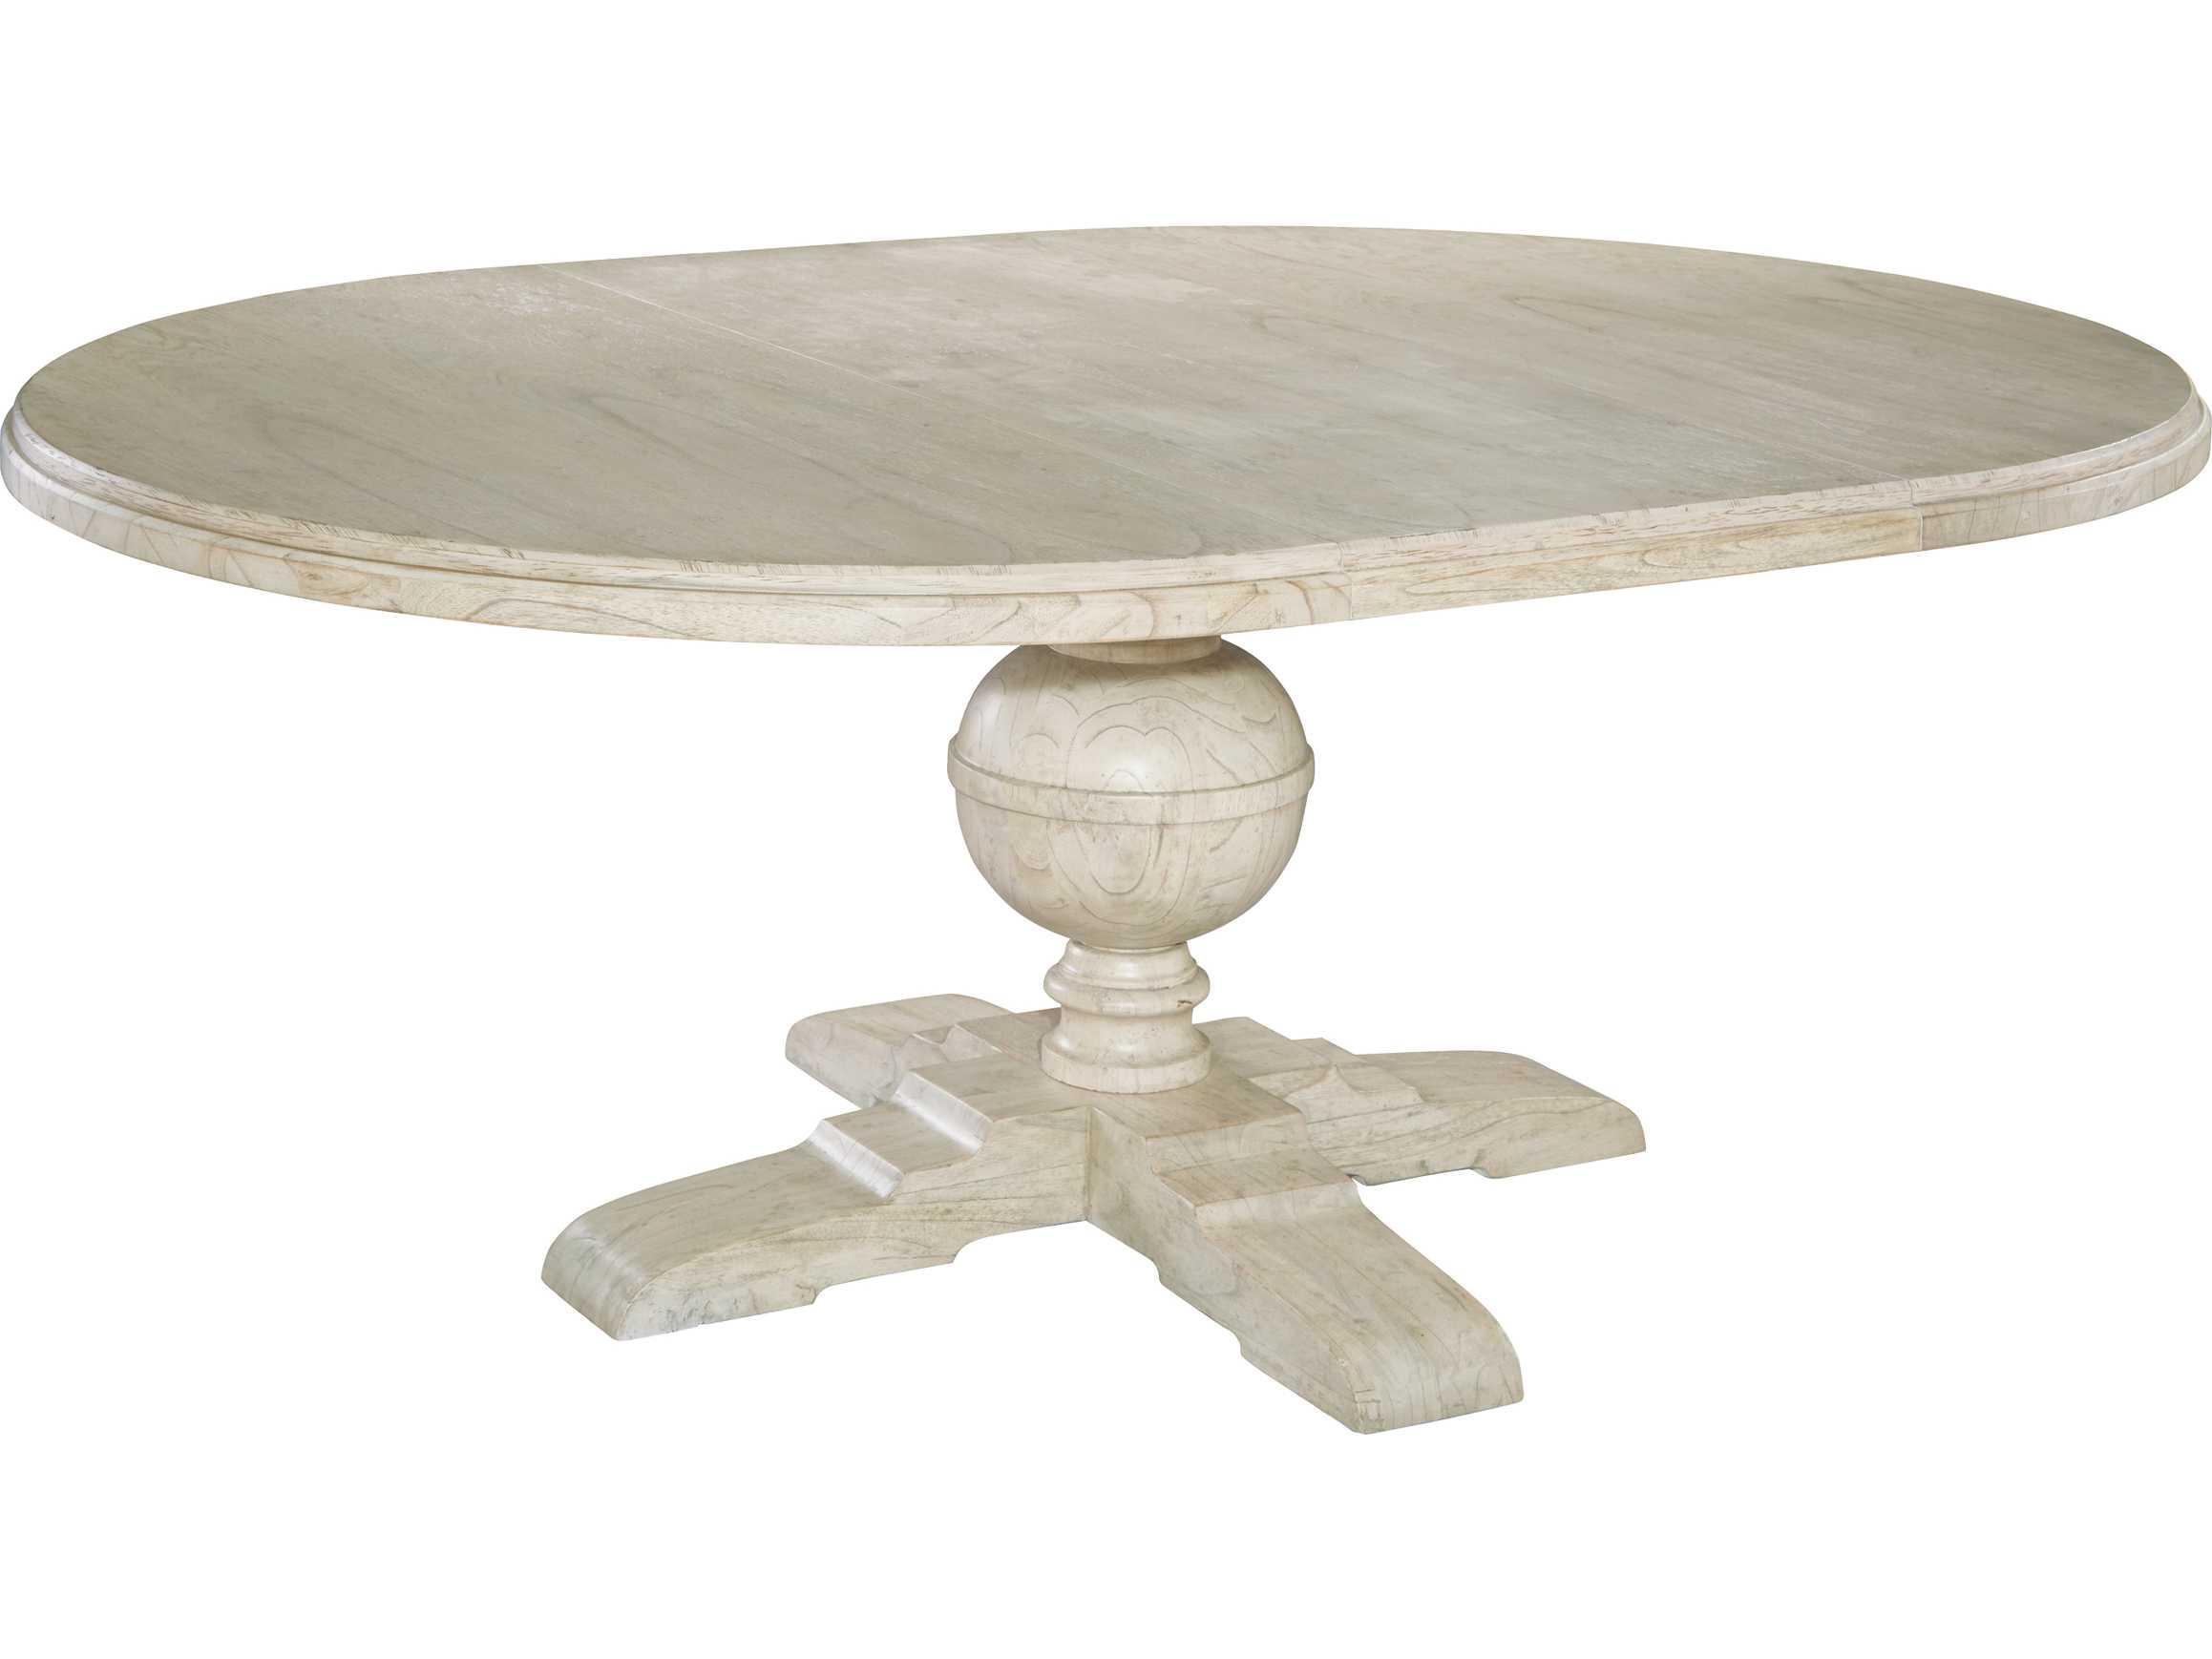 Hekman Homestead Linen 54 Round Pedestal Dining Table